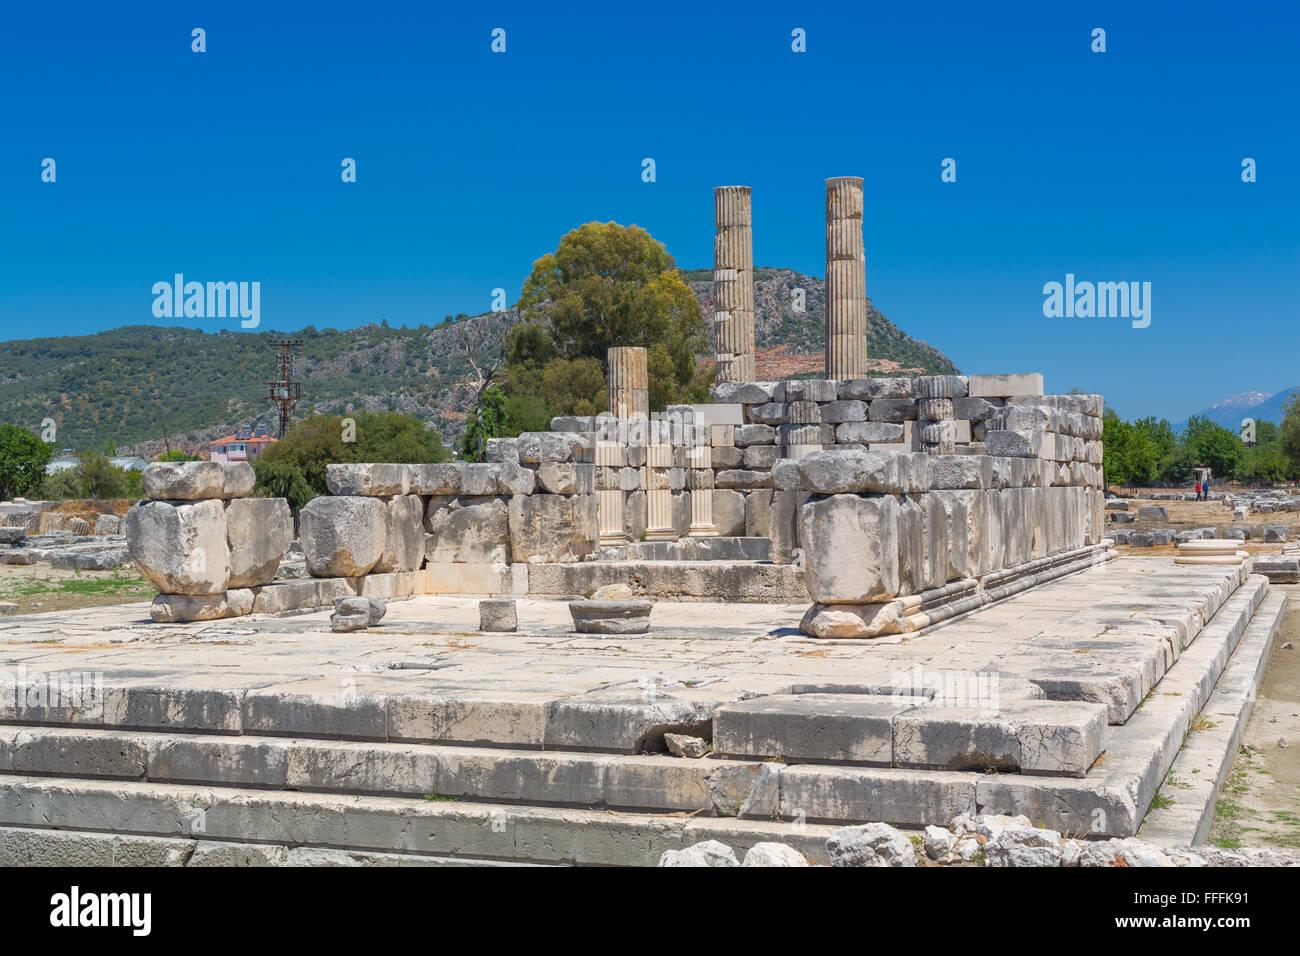 Ruins of ancient Letoon, Antalya Province, Turkey - Stock Image